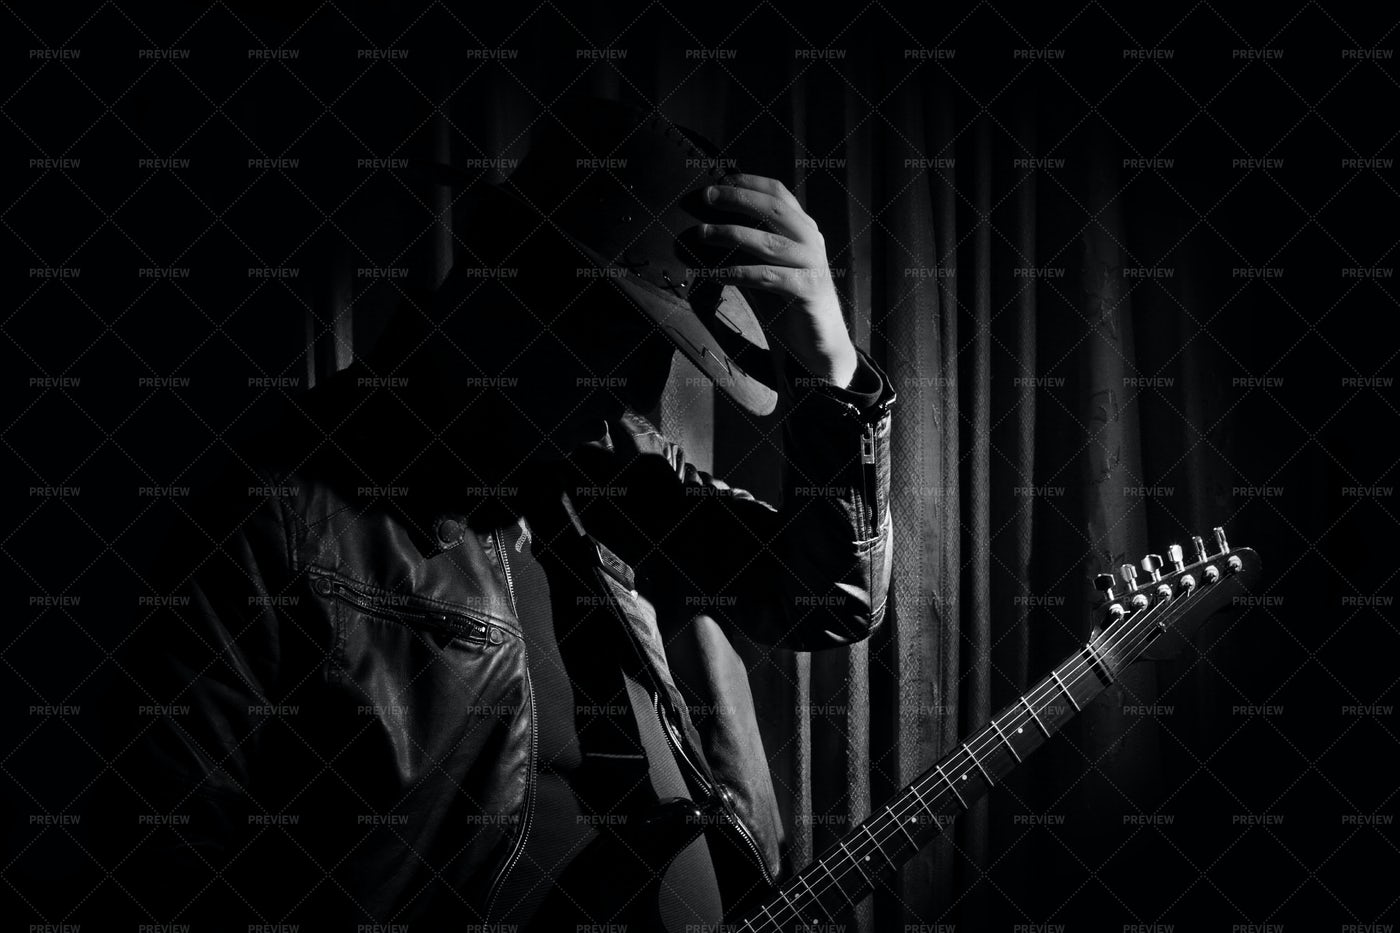 Guitarist In The Shadows: Stock Photos